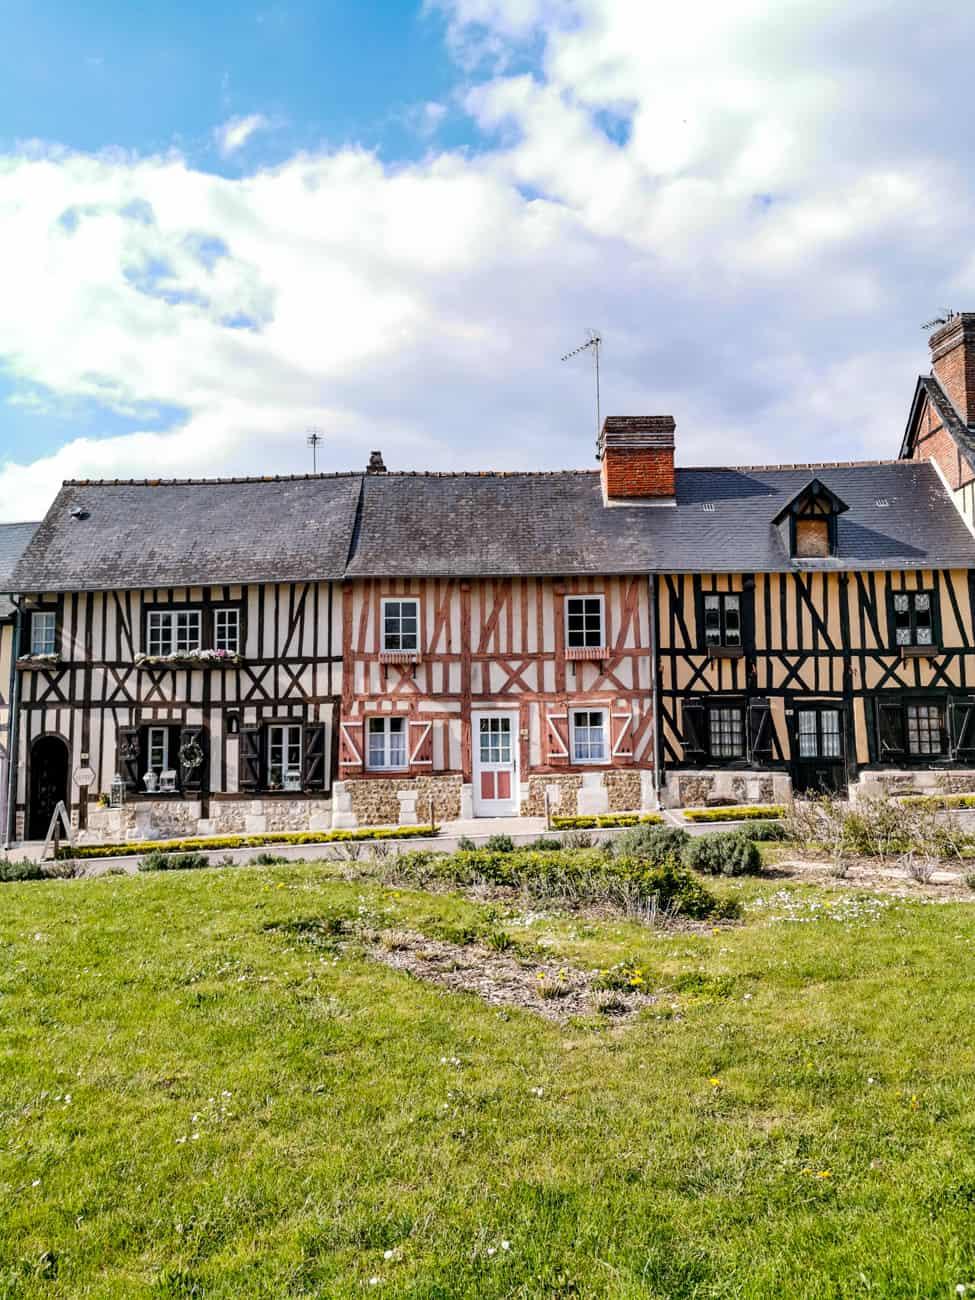 abbaye-bec-hellouin-village-3